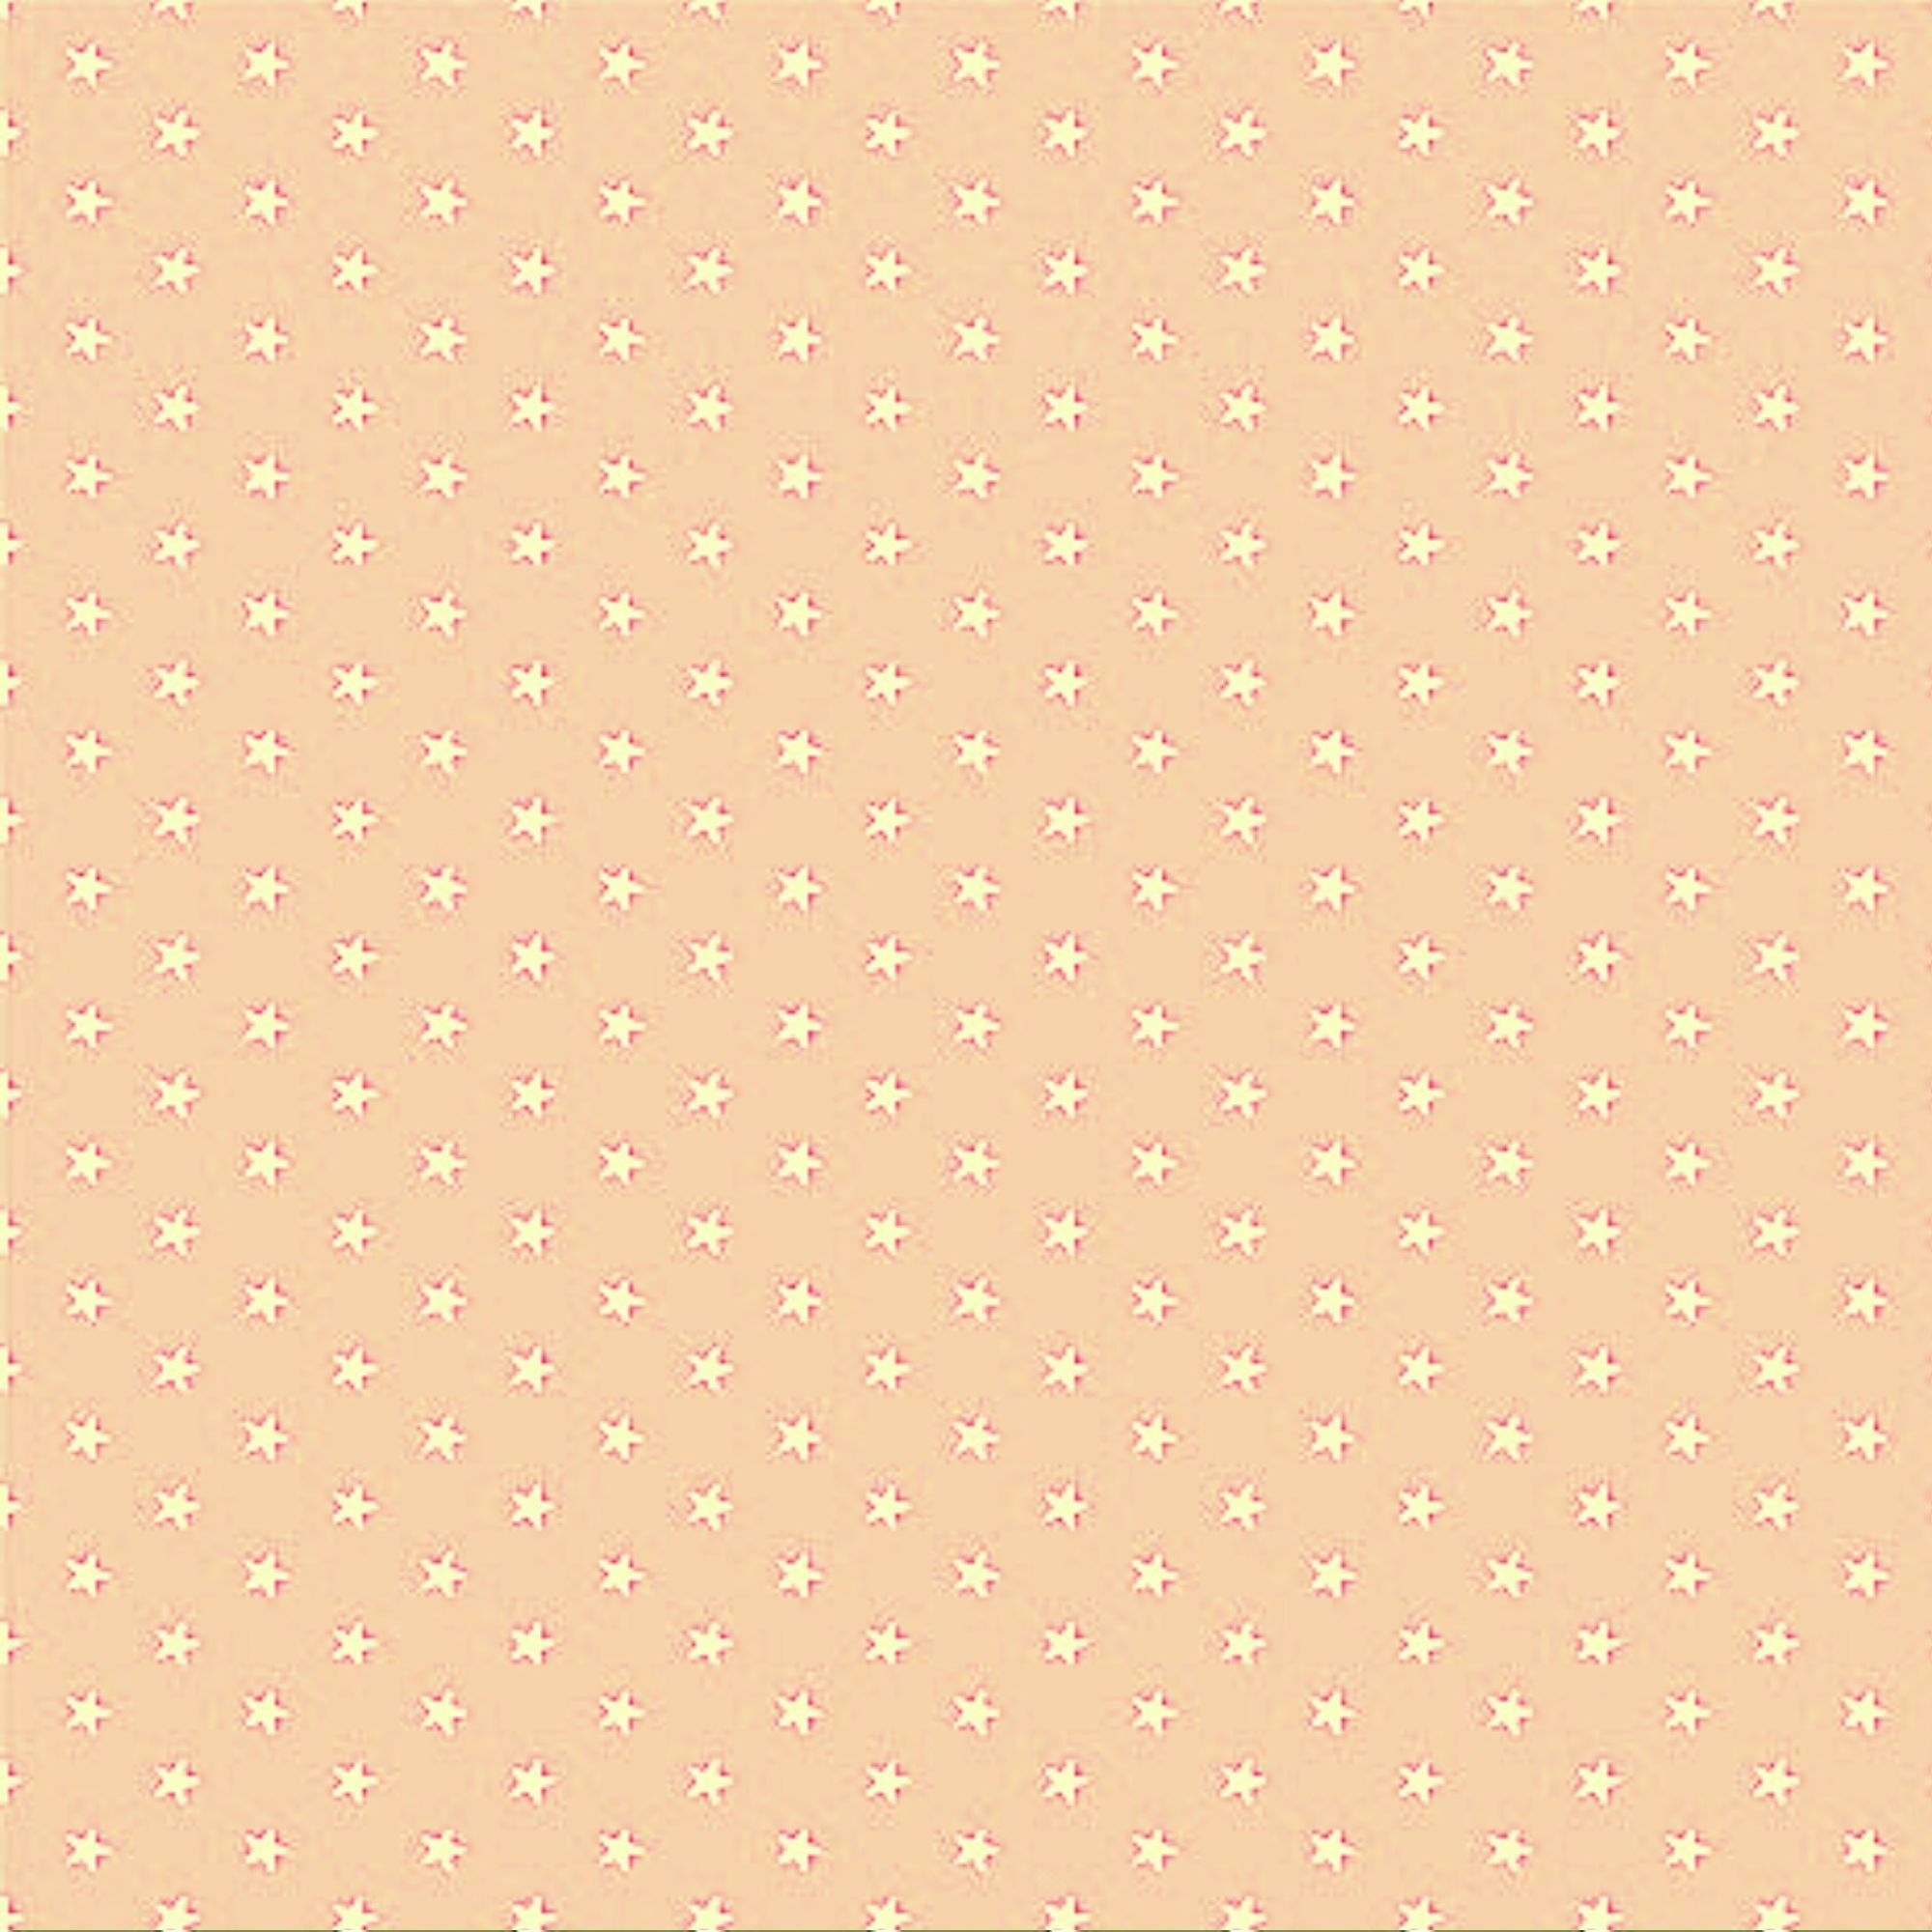 Tecido Tricoline  Estampa Mini Estrela Branca - Fundo Rosa Pele